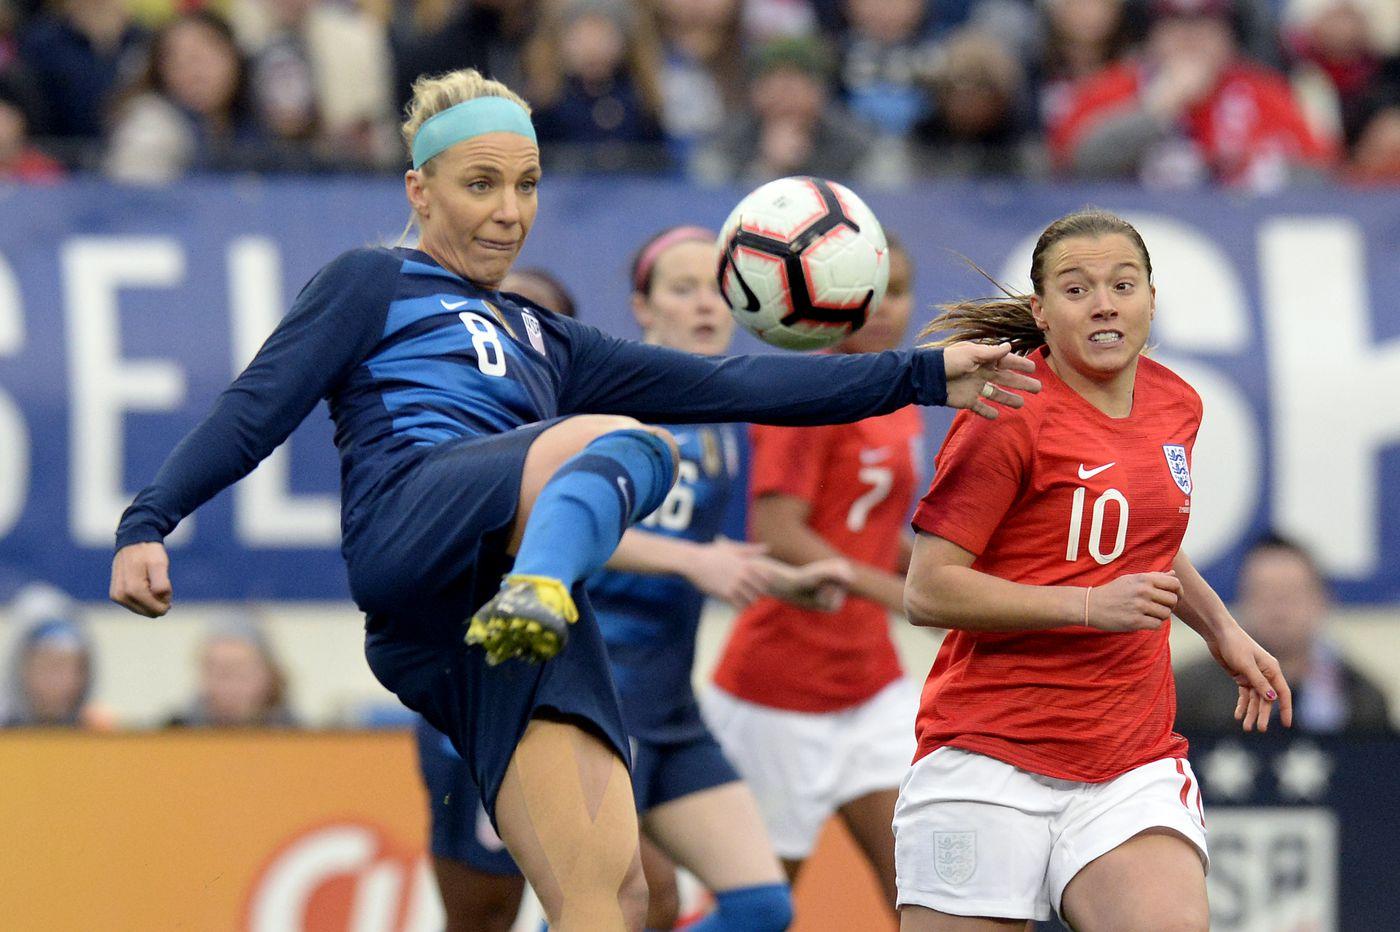 Tobin Heath, Megan Rapinoe score but USWNT held to 2-2 tie by England in SheBelieves Cup